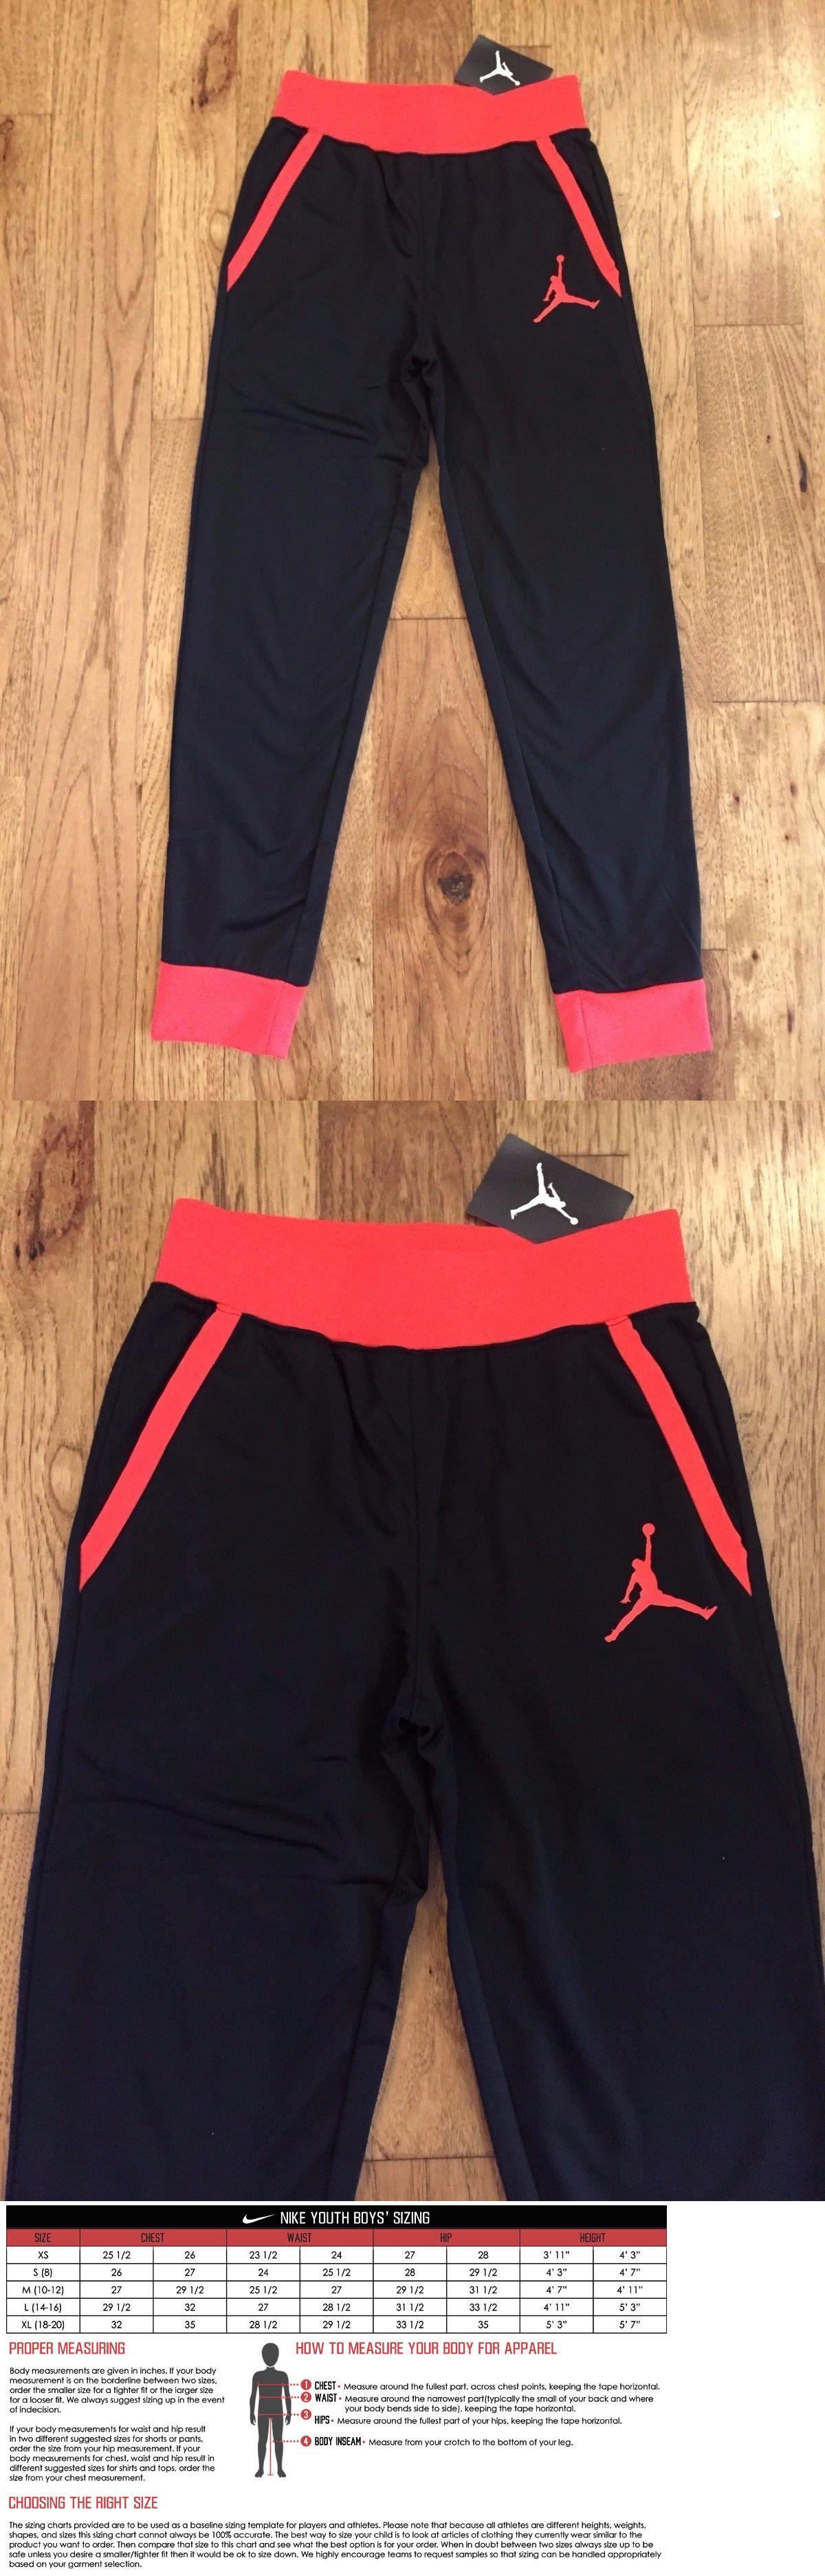 33dcbe1a918 Pants 51920: Air Jordan Jumpman Youth Big Boys Dri-Fit Fleece Jogger Pants  M L Xl -> BUY IT NOW ONLY: $37.66 on eBay!